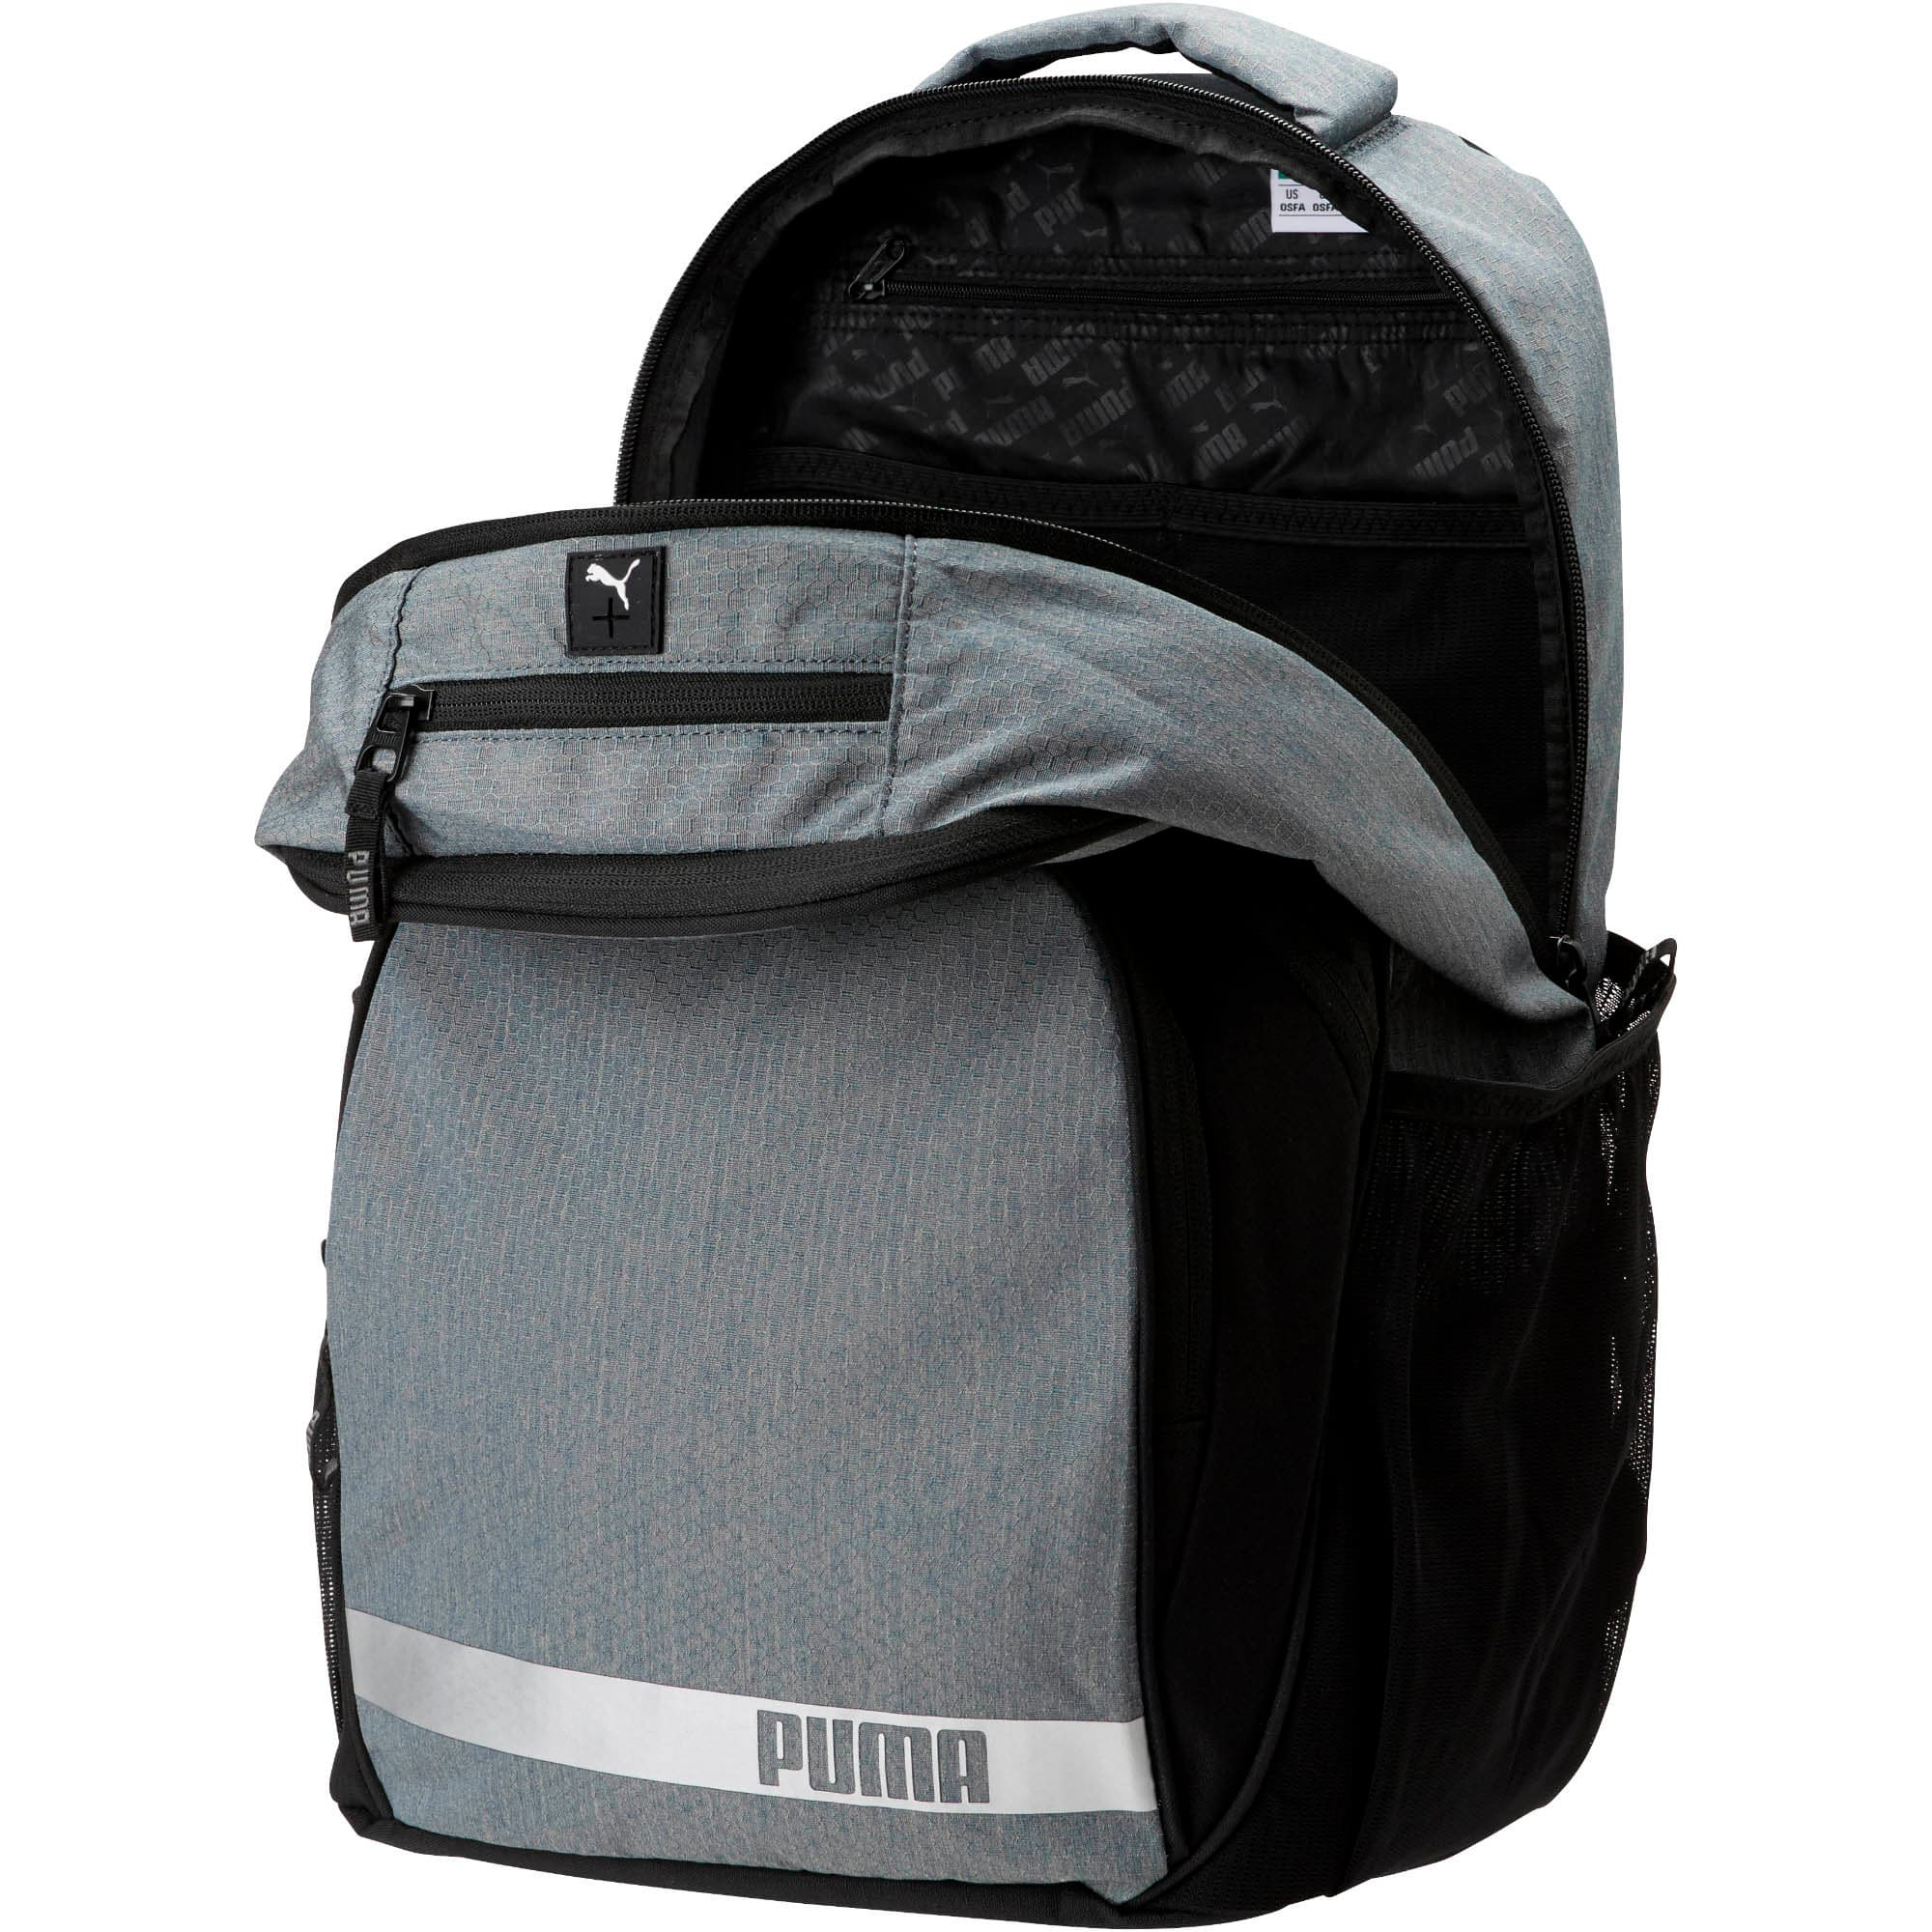 Thumbnail 2 of Formation 2.0 Ball Backpack, Grey/Black, medium